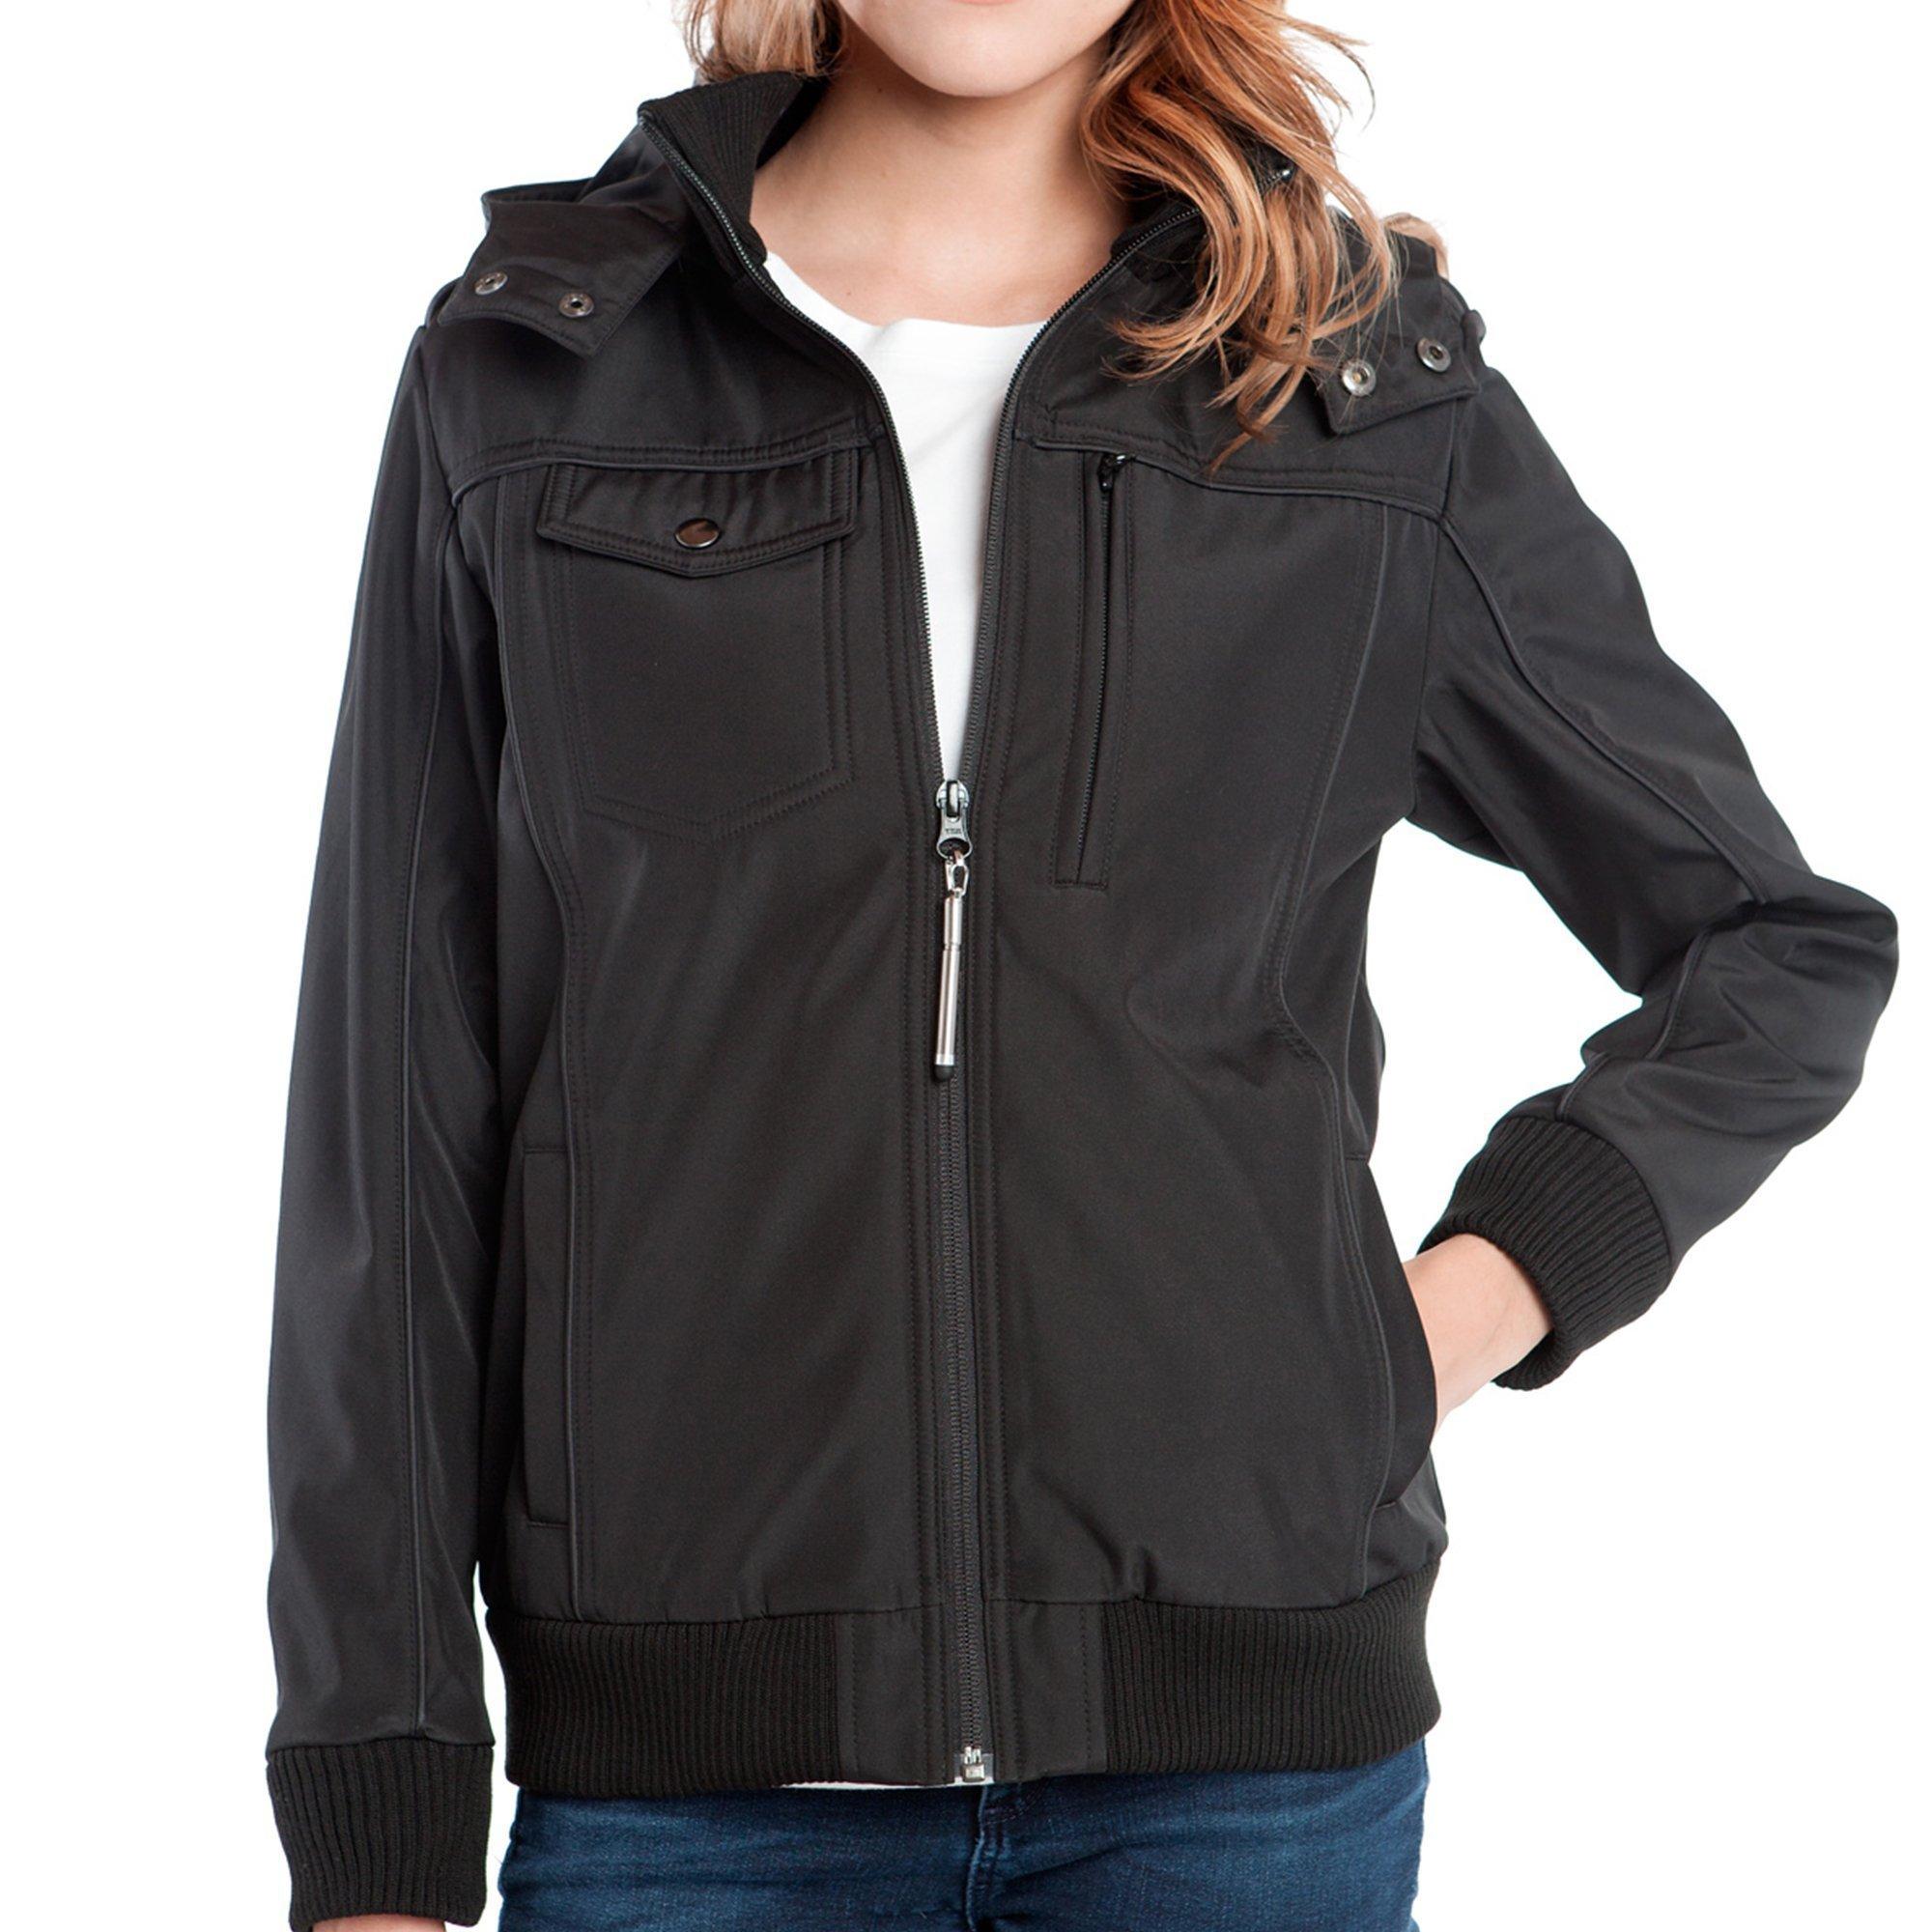 Baubax Travel Jacket - Bomber - Female - Black - Small